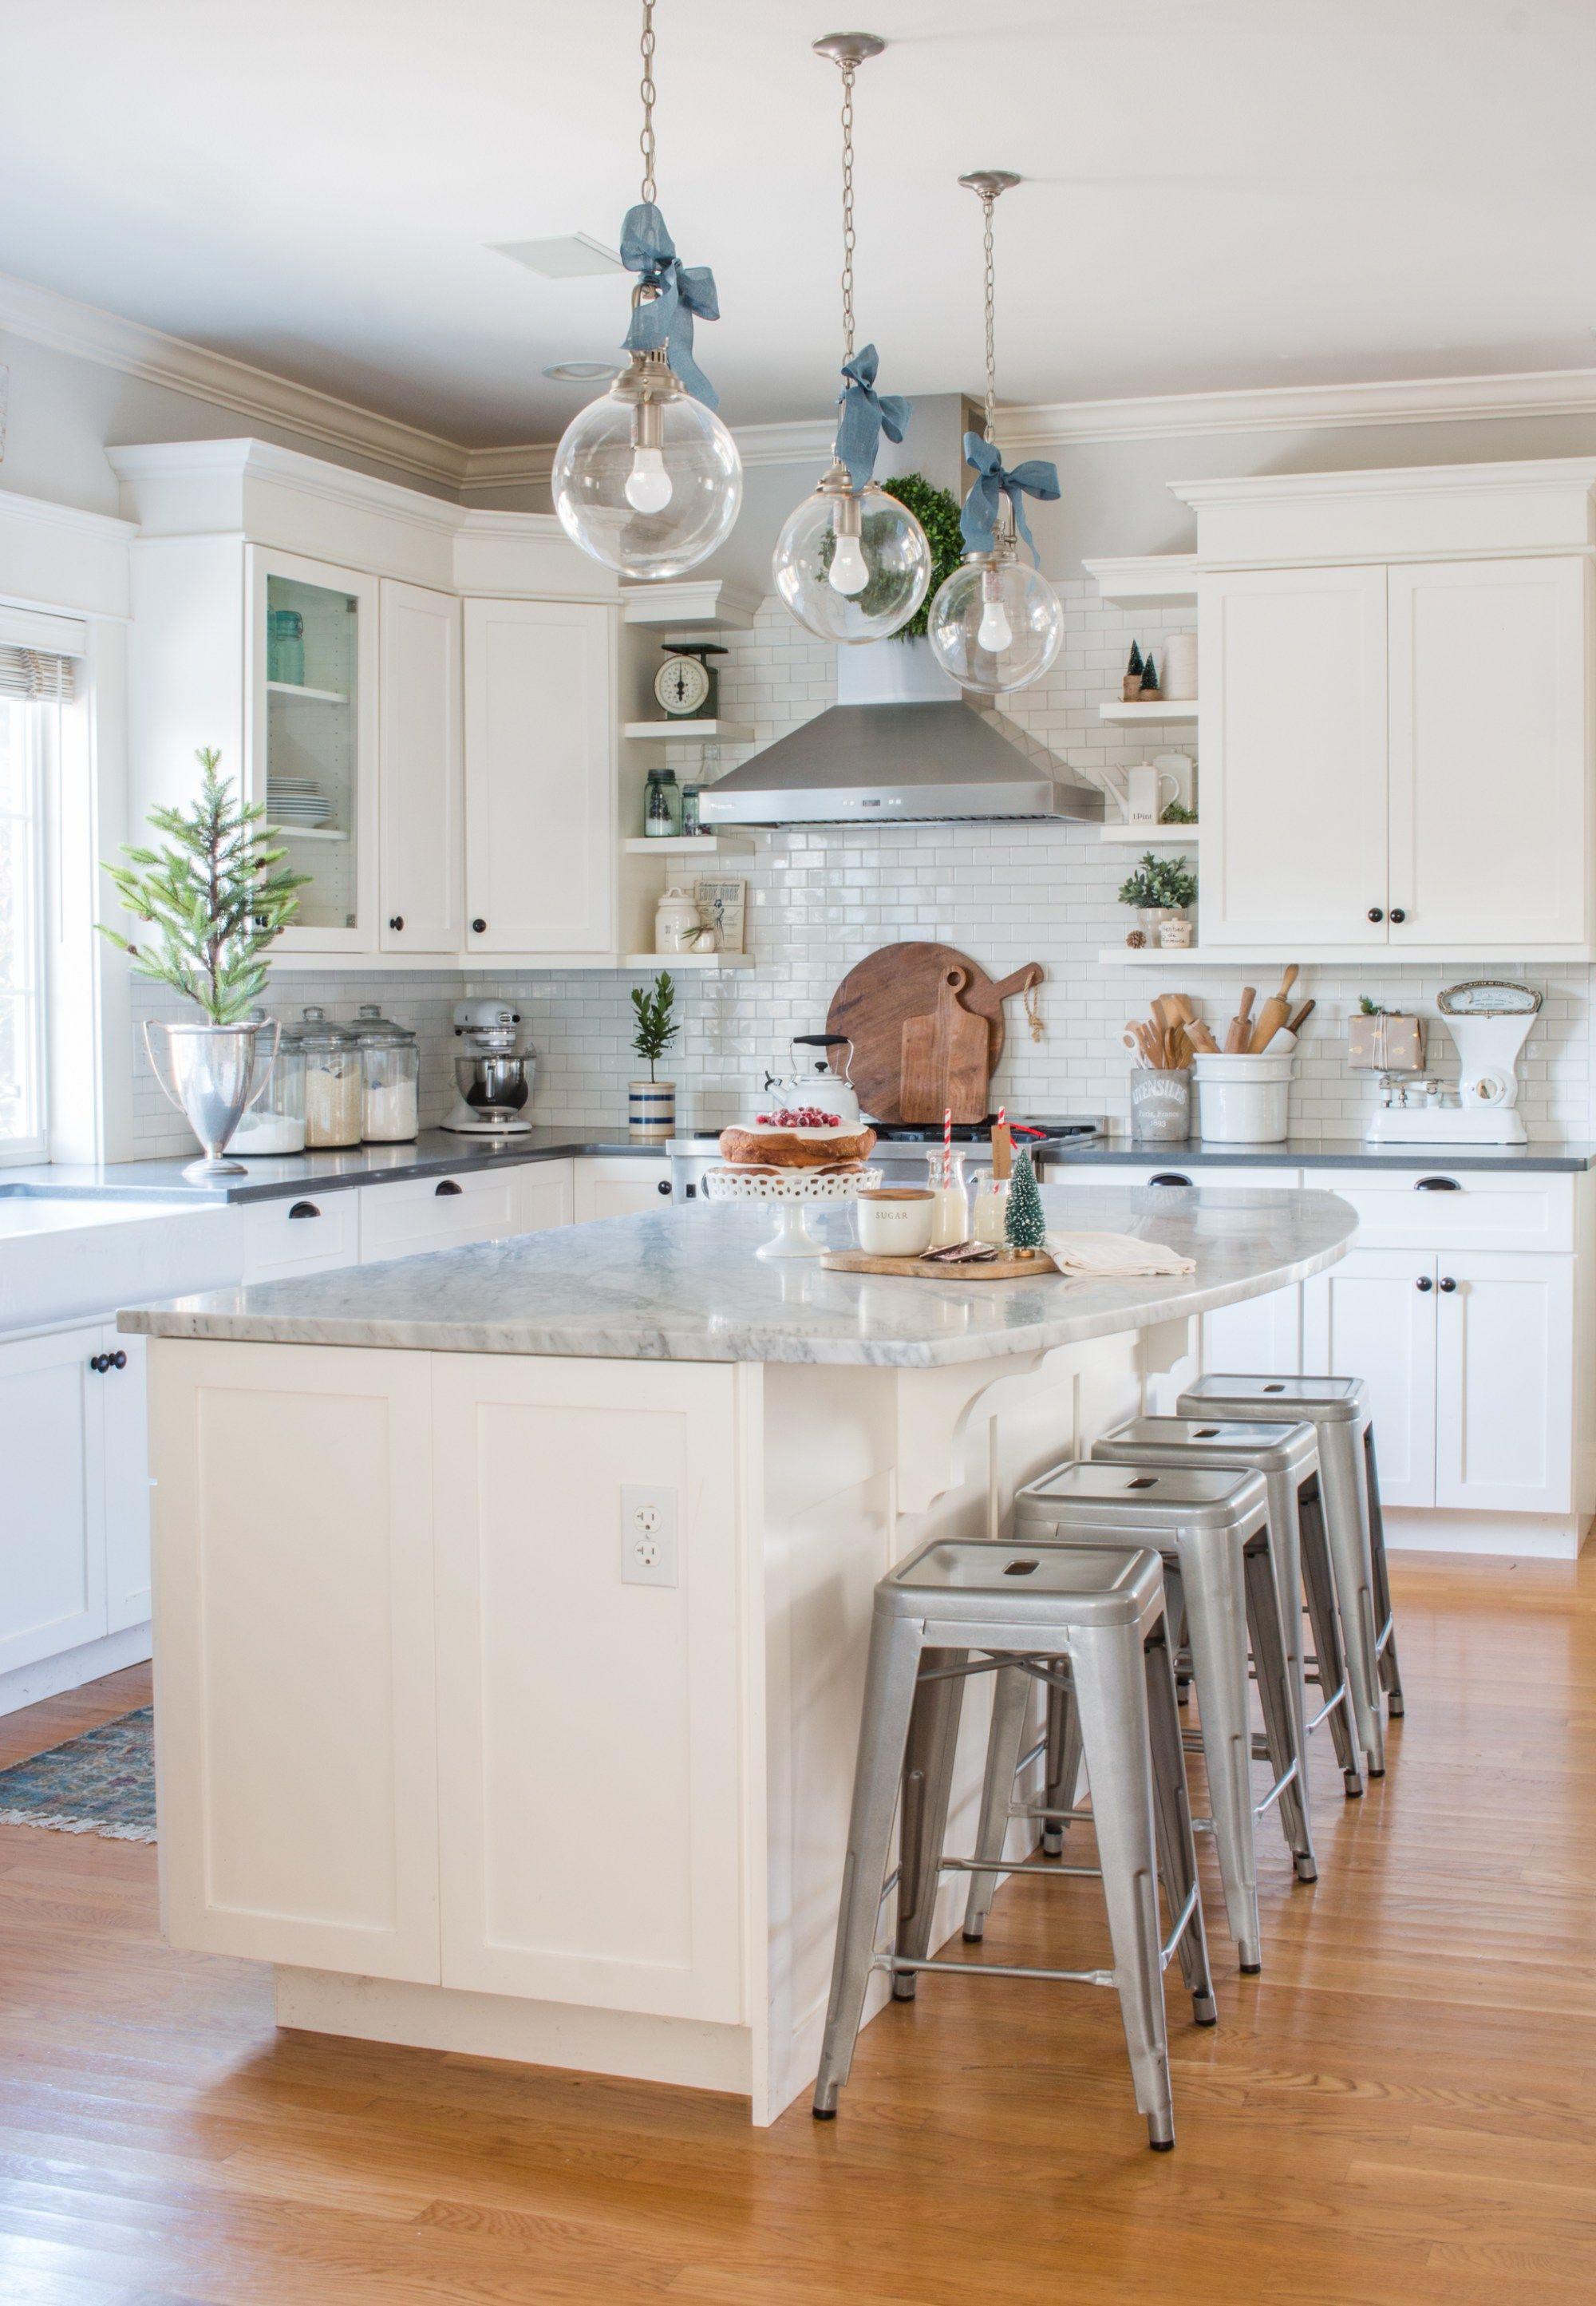 simple white christmas kitchen kitchen design kitchen remodel home kitchens on kitchen ideas simple id=56826